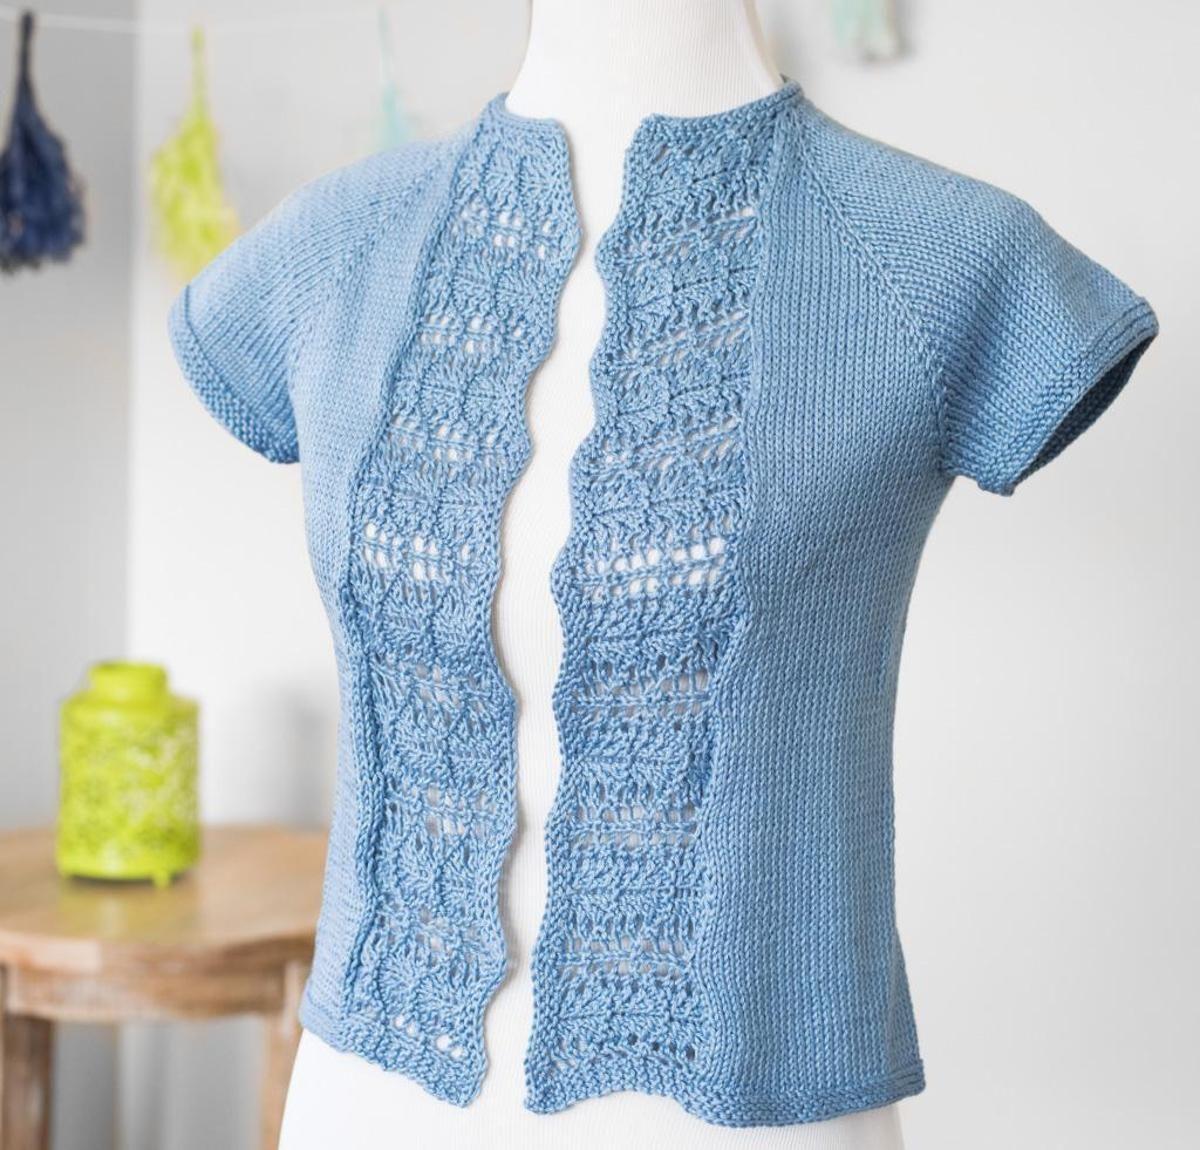 Summer Waves Cardigan Knitting Kit | Summer waves, Yarns and Crochet